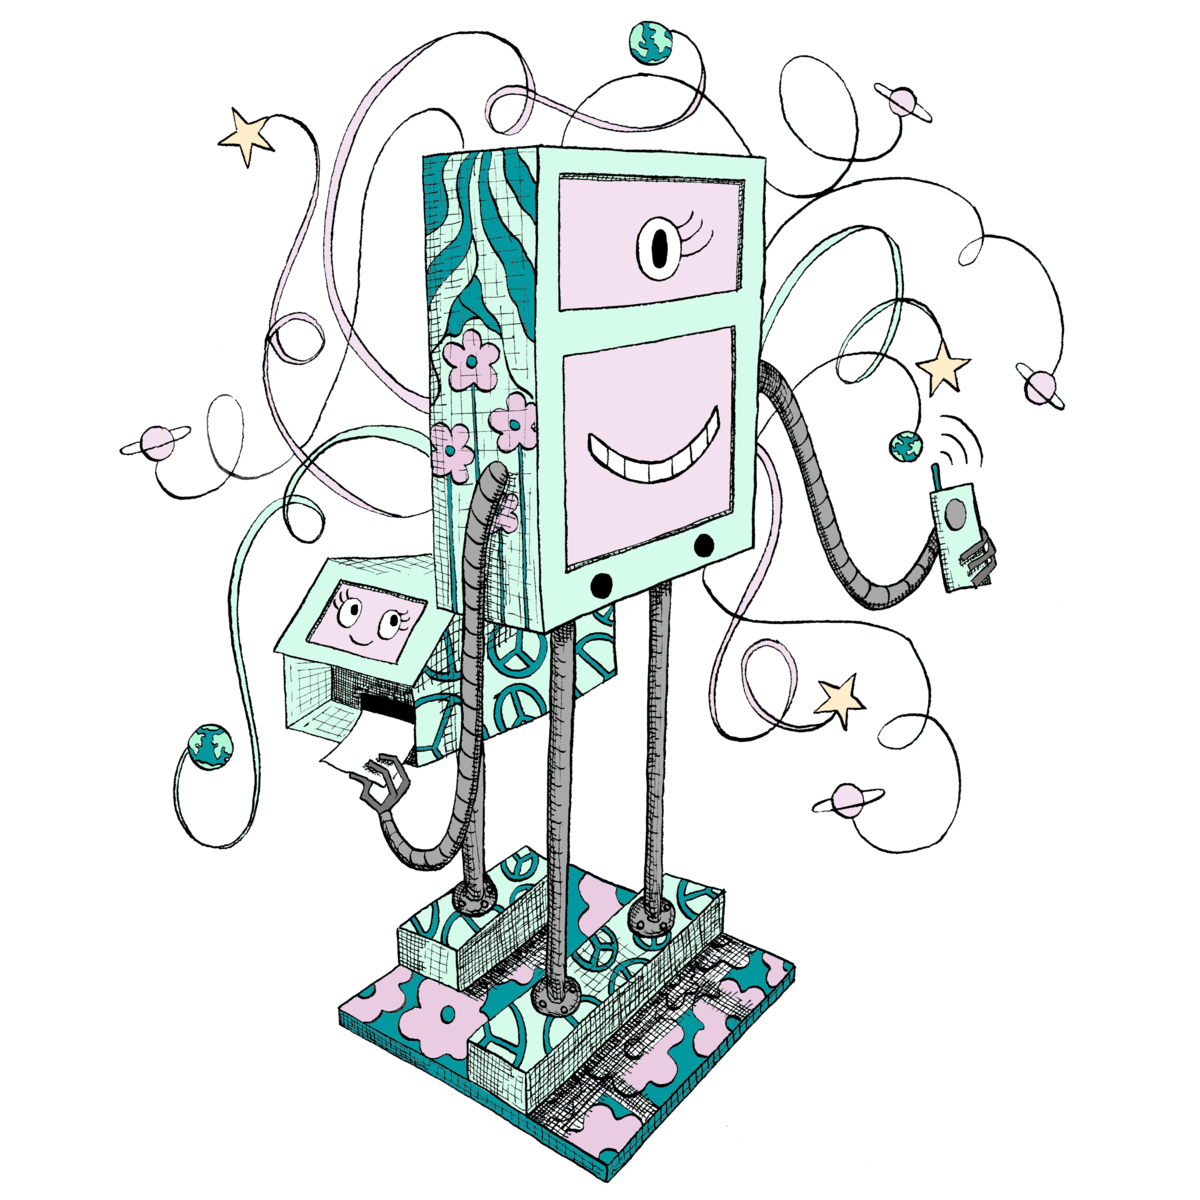 Robot Booth  | Atlanta Photo Booth Rental - Atlanta, GA - Party & Event Planning